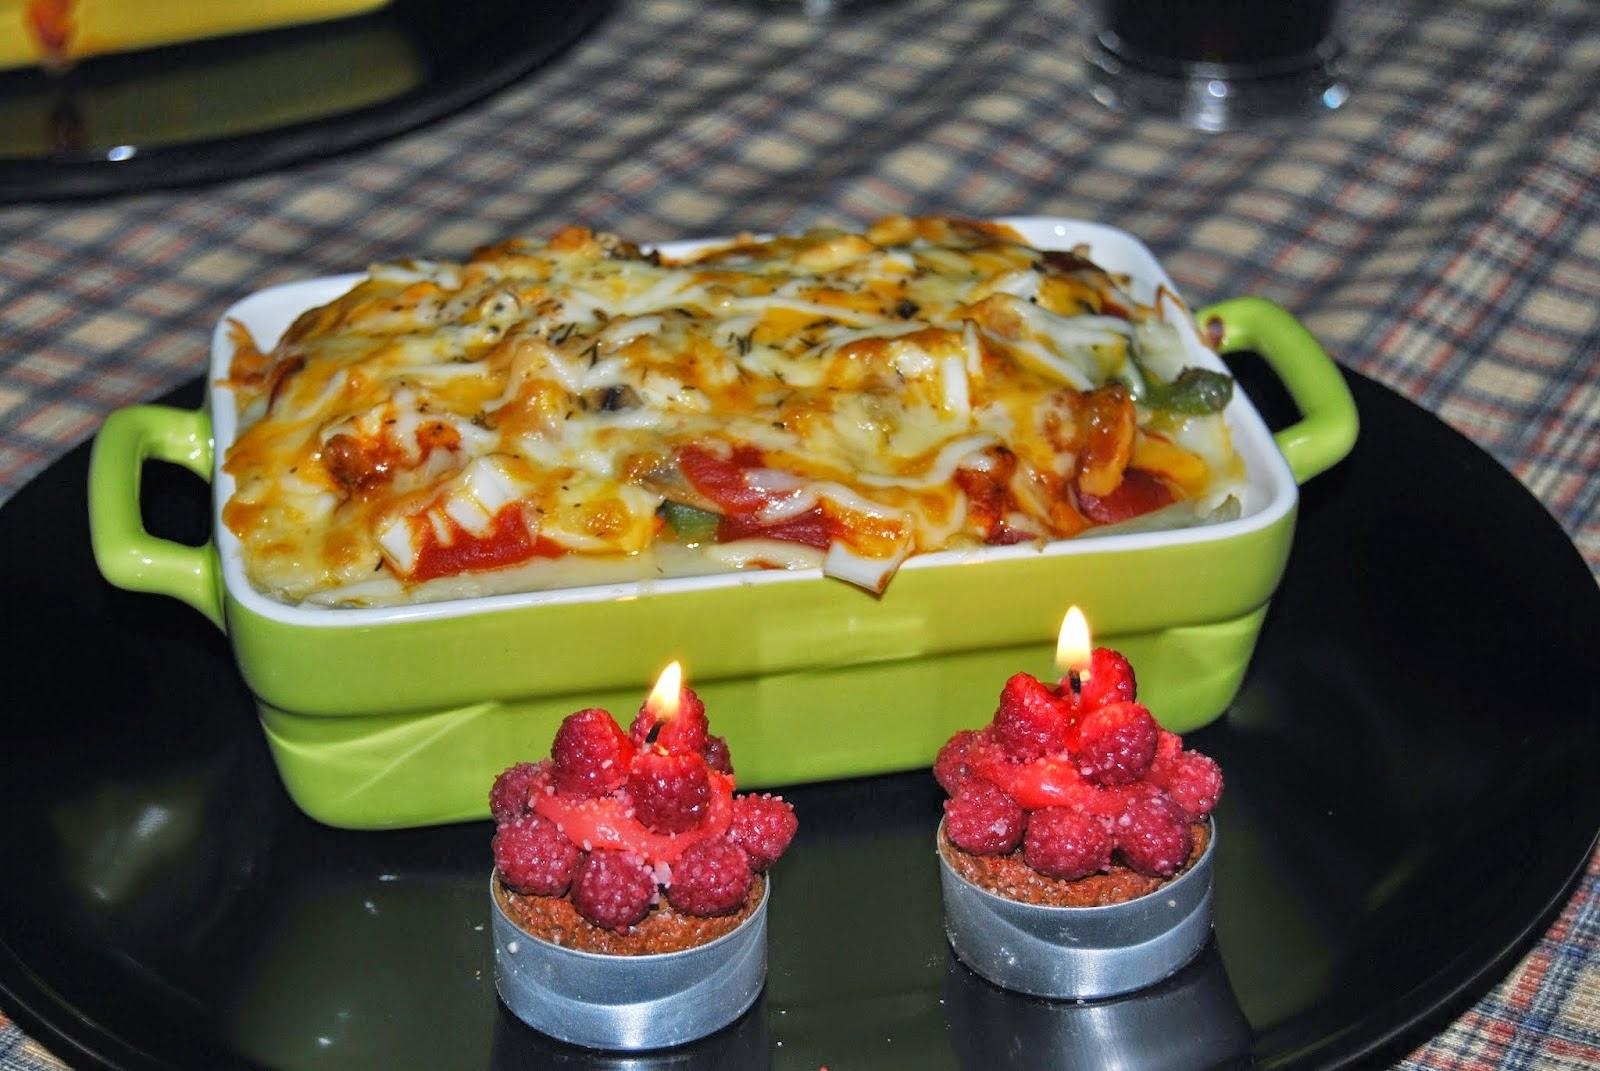 http://lashermanasyunamarx.blogspot.com.es/2014/04/timbal-con-de-jamon-ingredientes-4.html